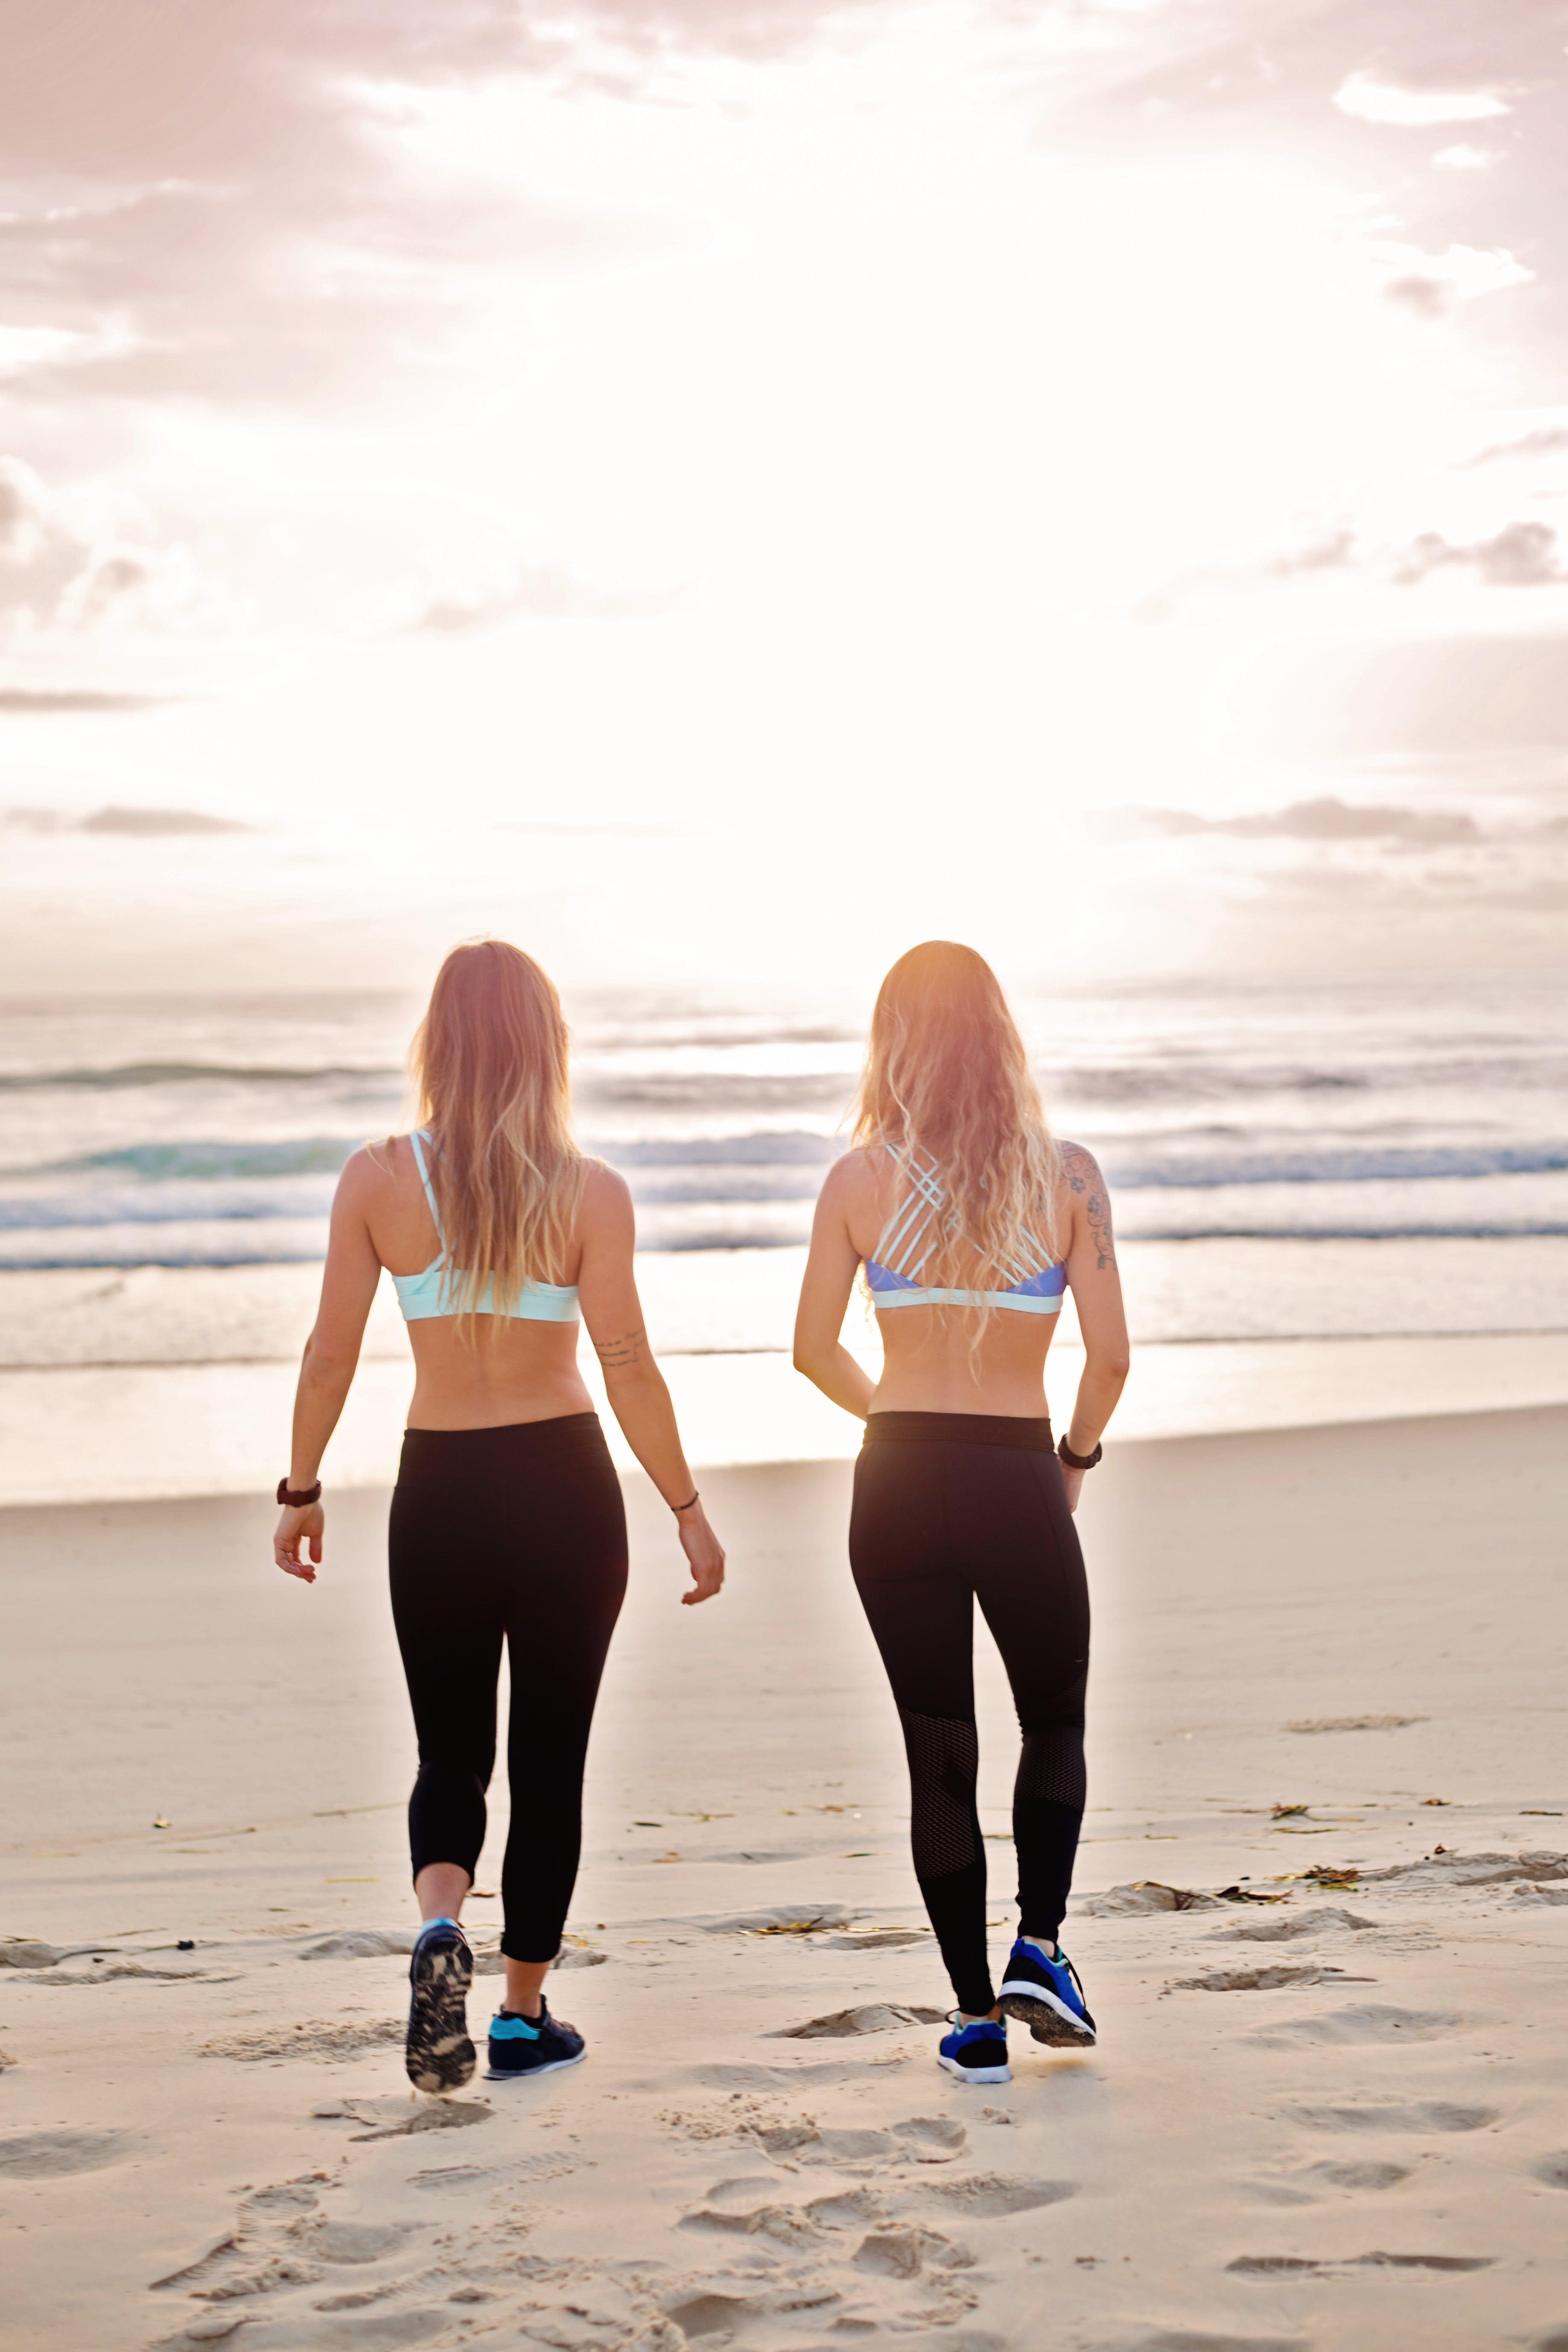 Two Women Walking on Seashore While Talking